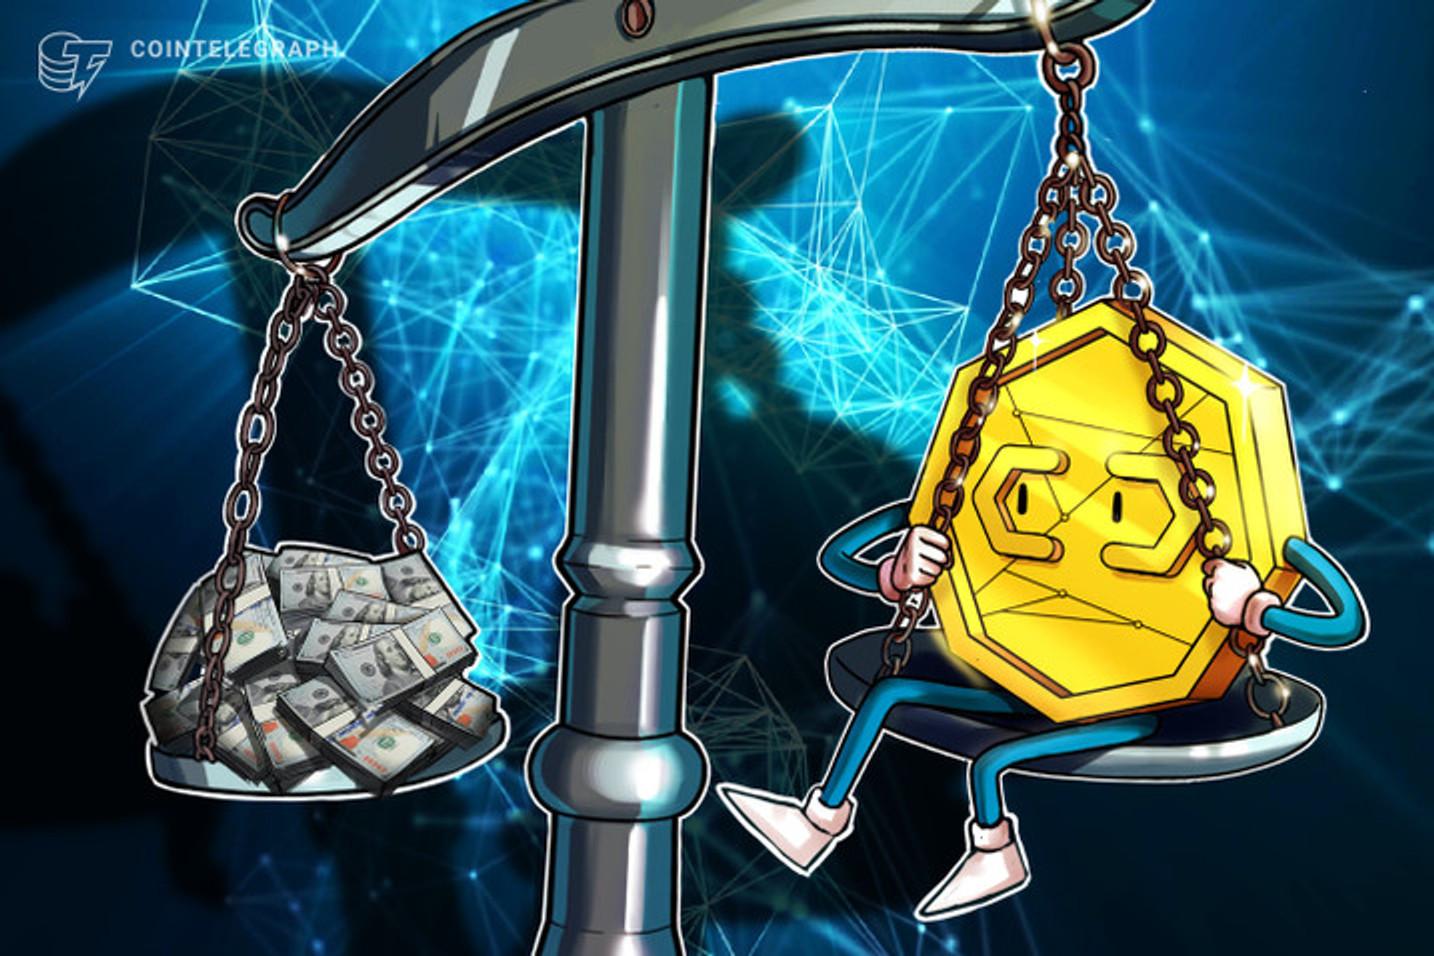 SatoshiTango aclaró que continúa normalmente con las transacciones de criptomonedas en Argentina, incluyendo a DAI